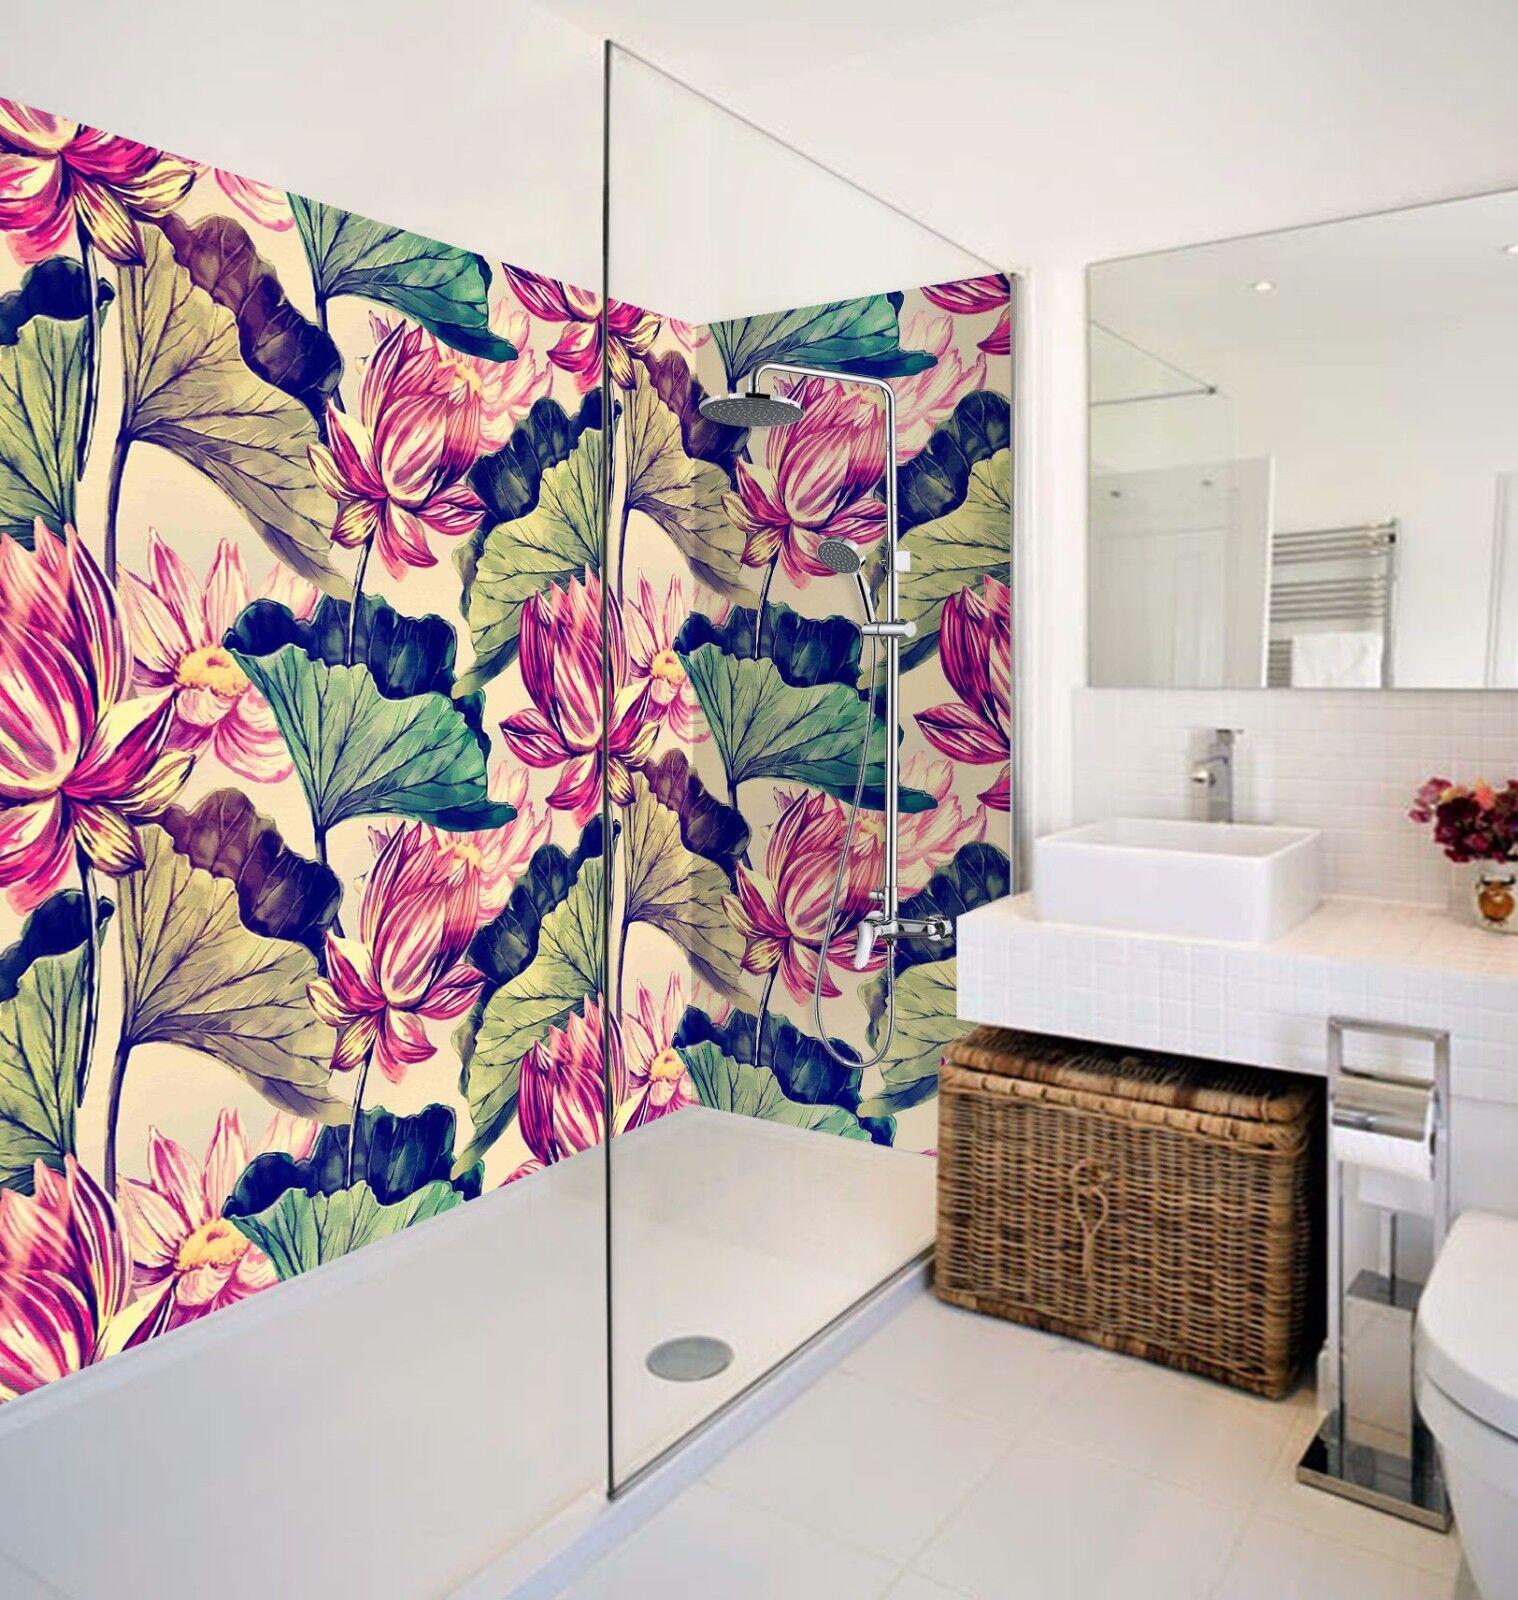 3D Lotus Leaf 7016  WallPaper Bathroom Print Decal Wall Deco AJ WALLPAPER AU